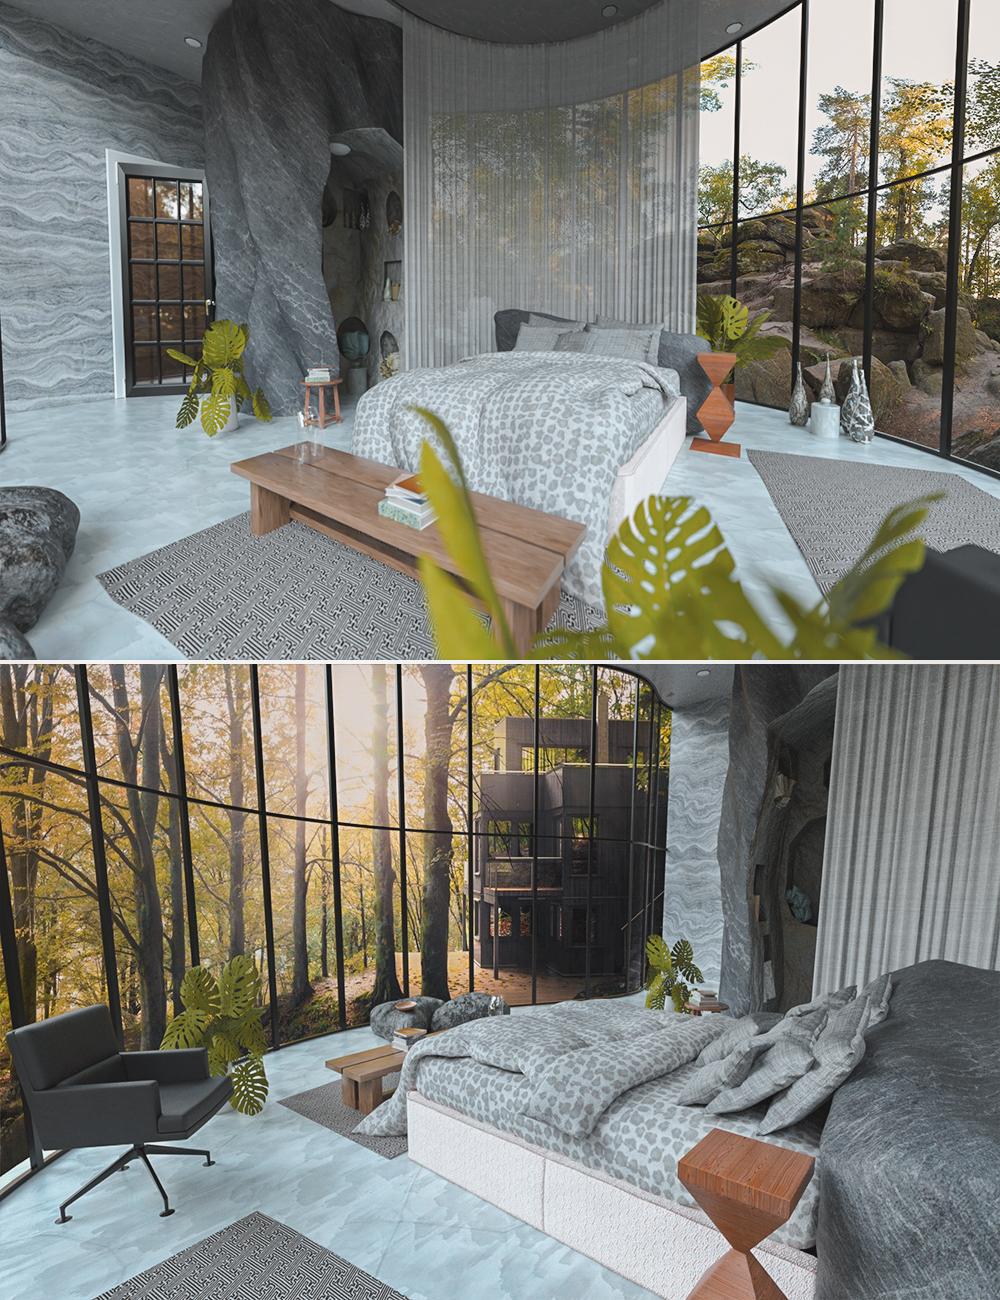 Casa Selva by: Tesla3dCorp, 3D Models by Daz 3D